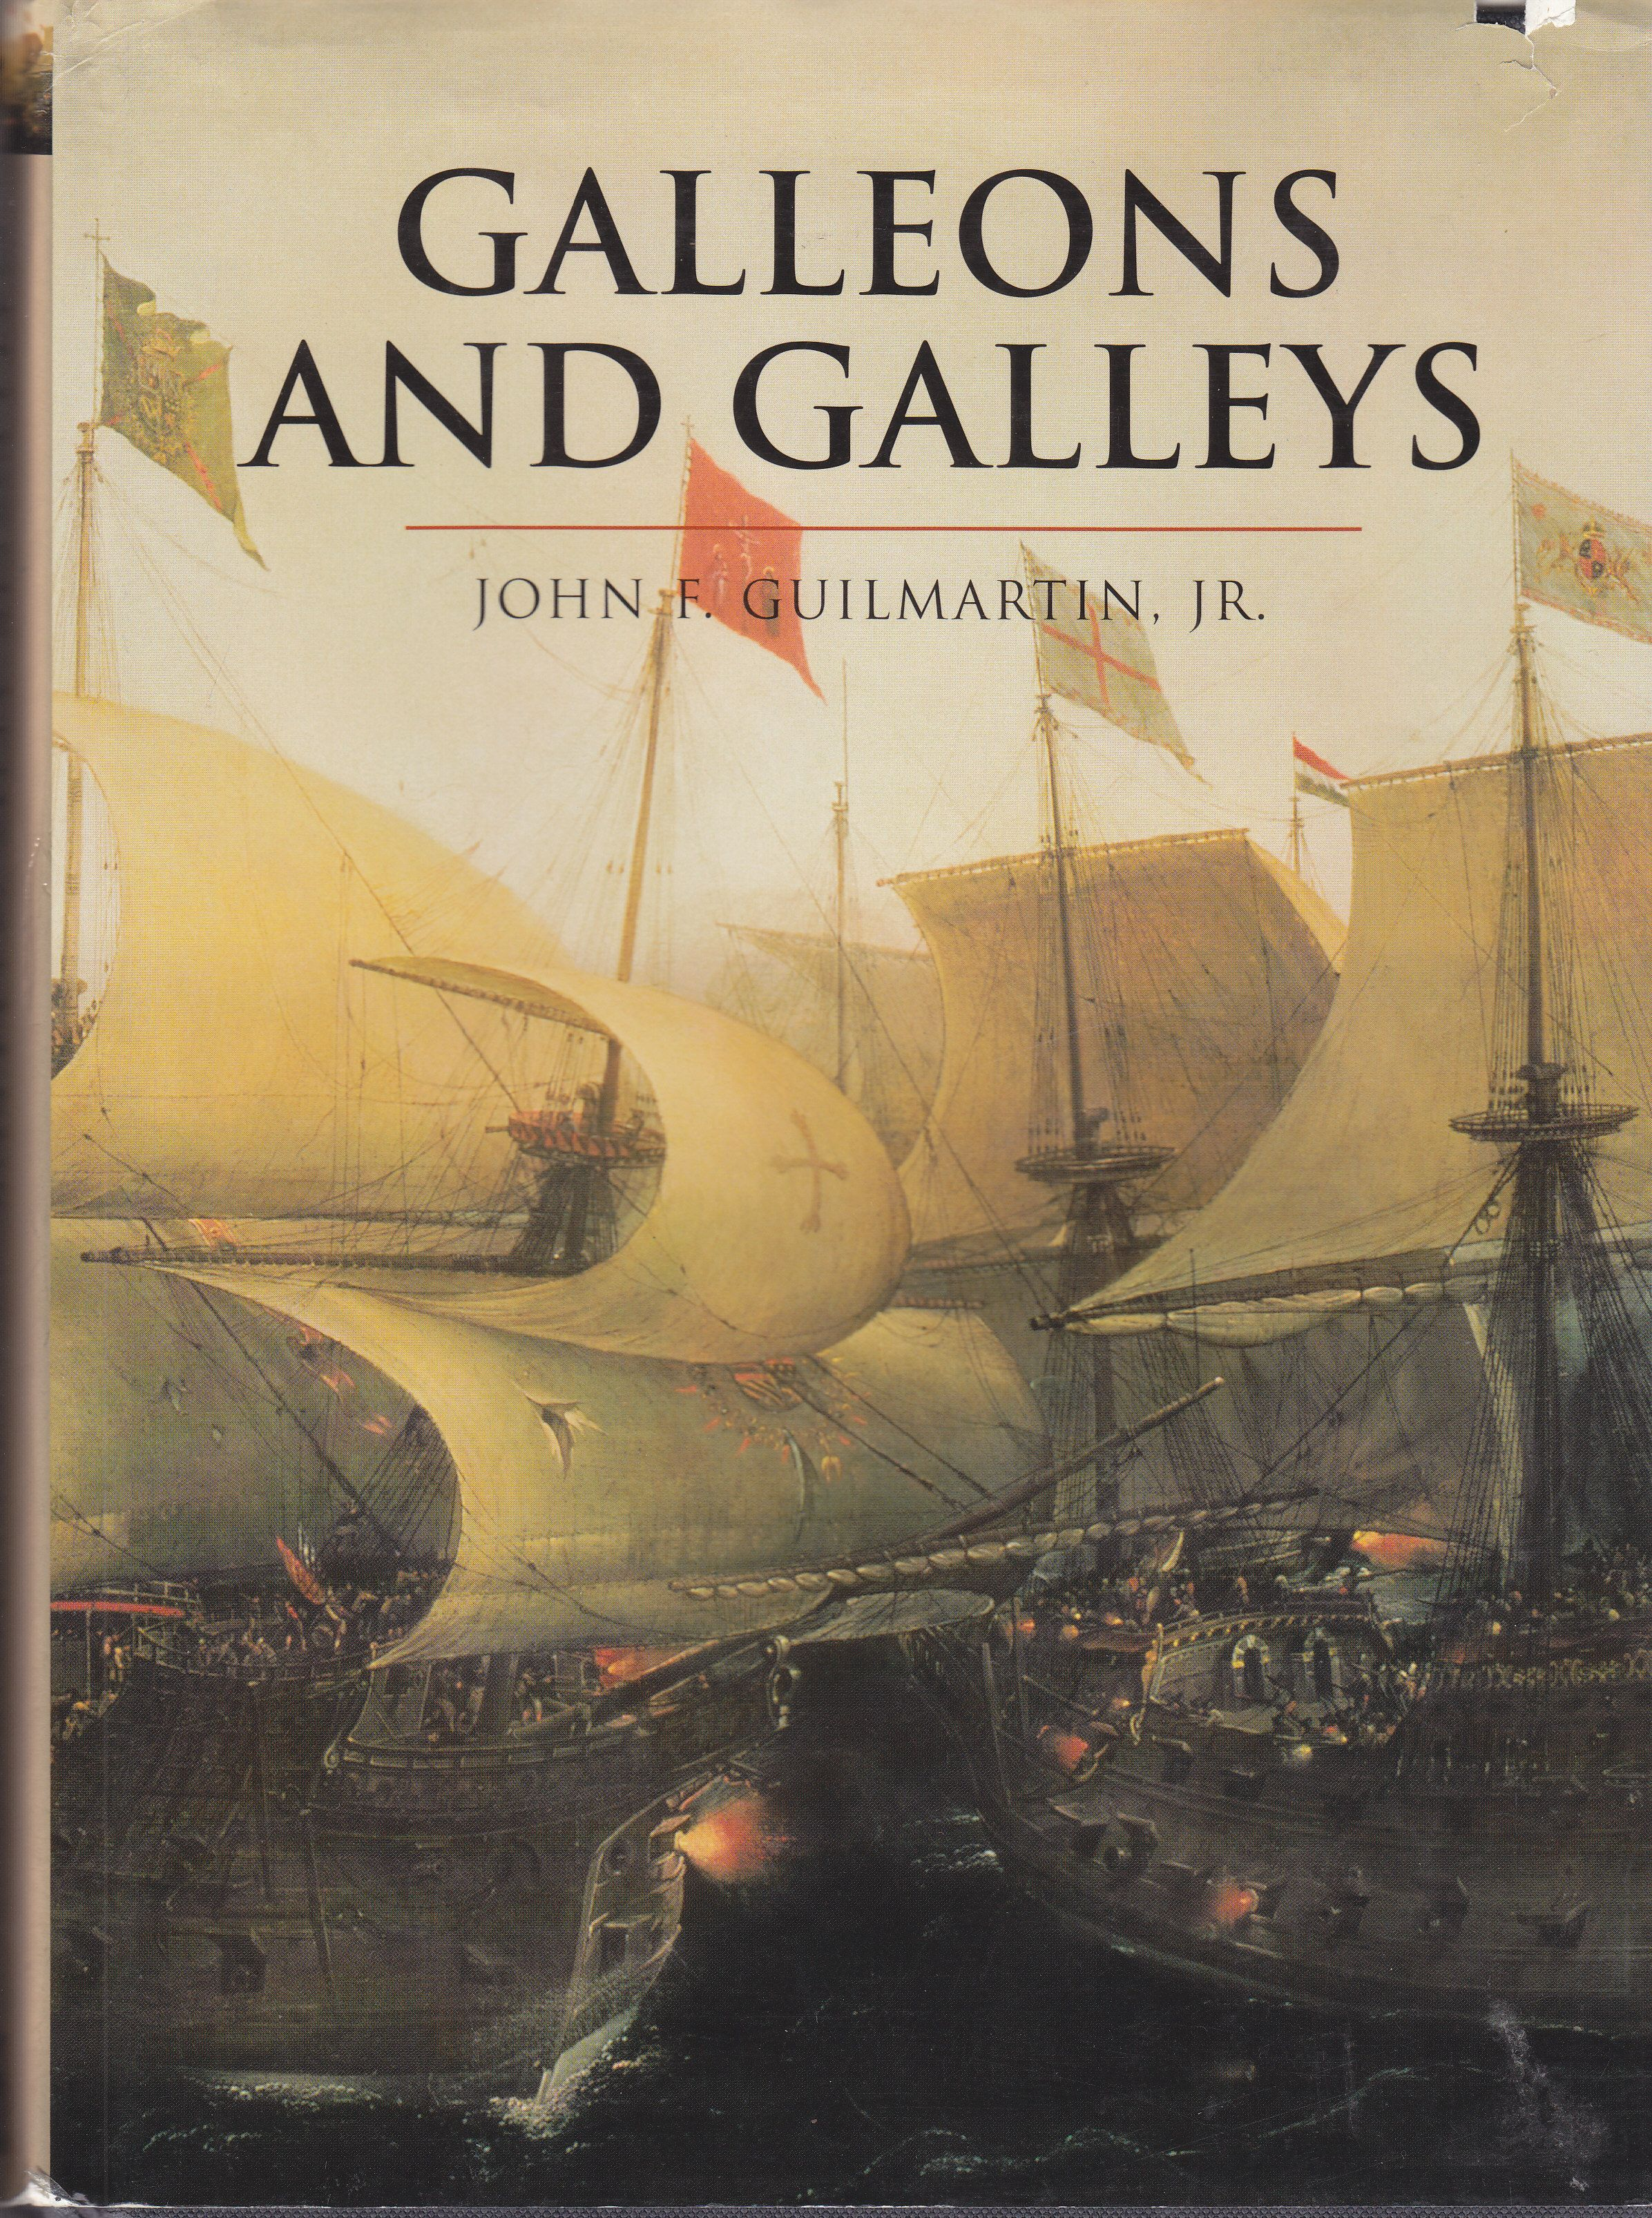 Galleons and galleys john f guilmartin jr galleon